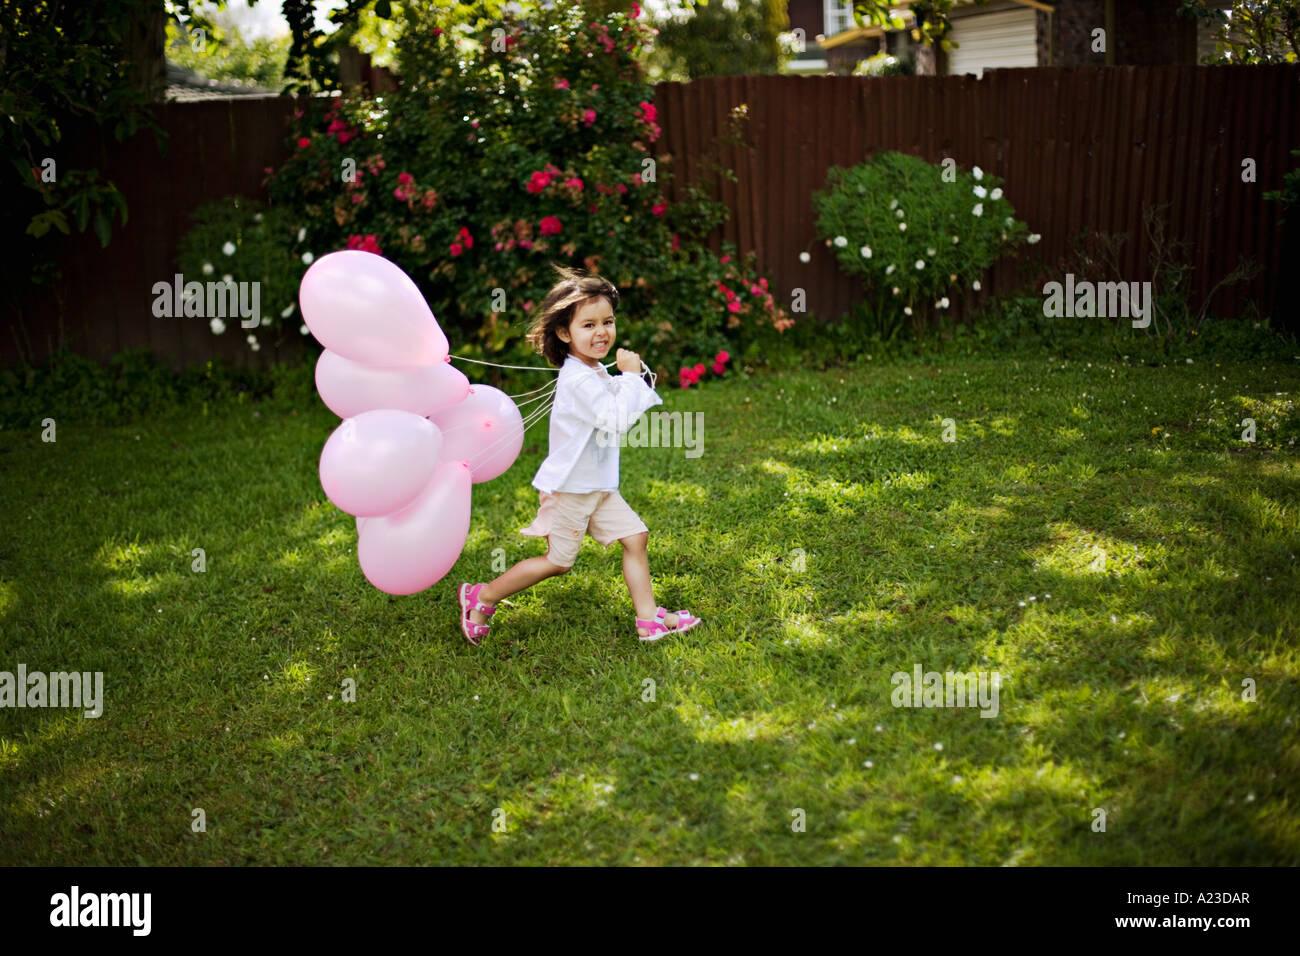 Girl runs with pink balloons - Stock Image